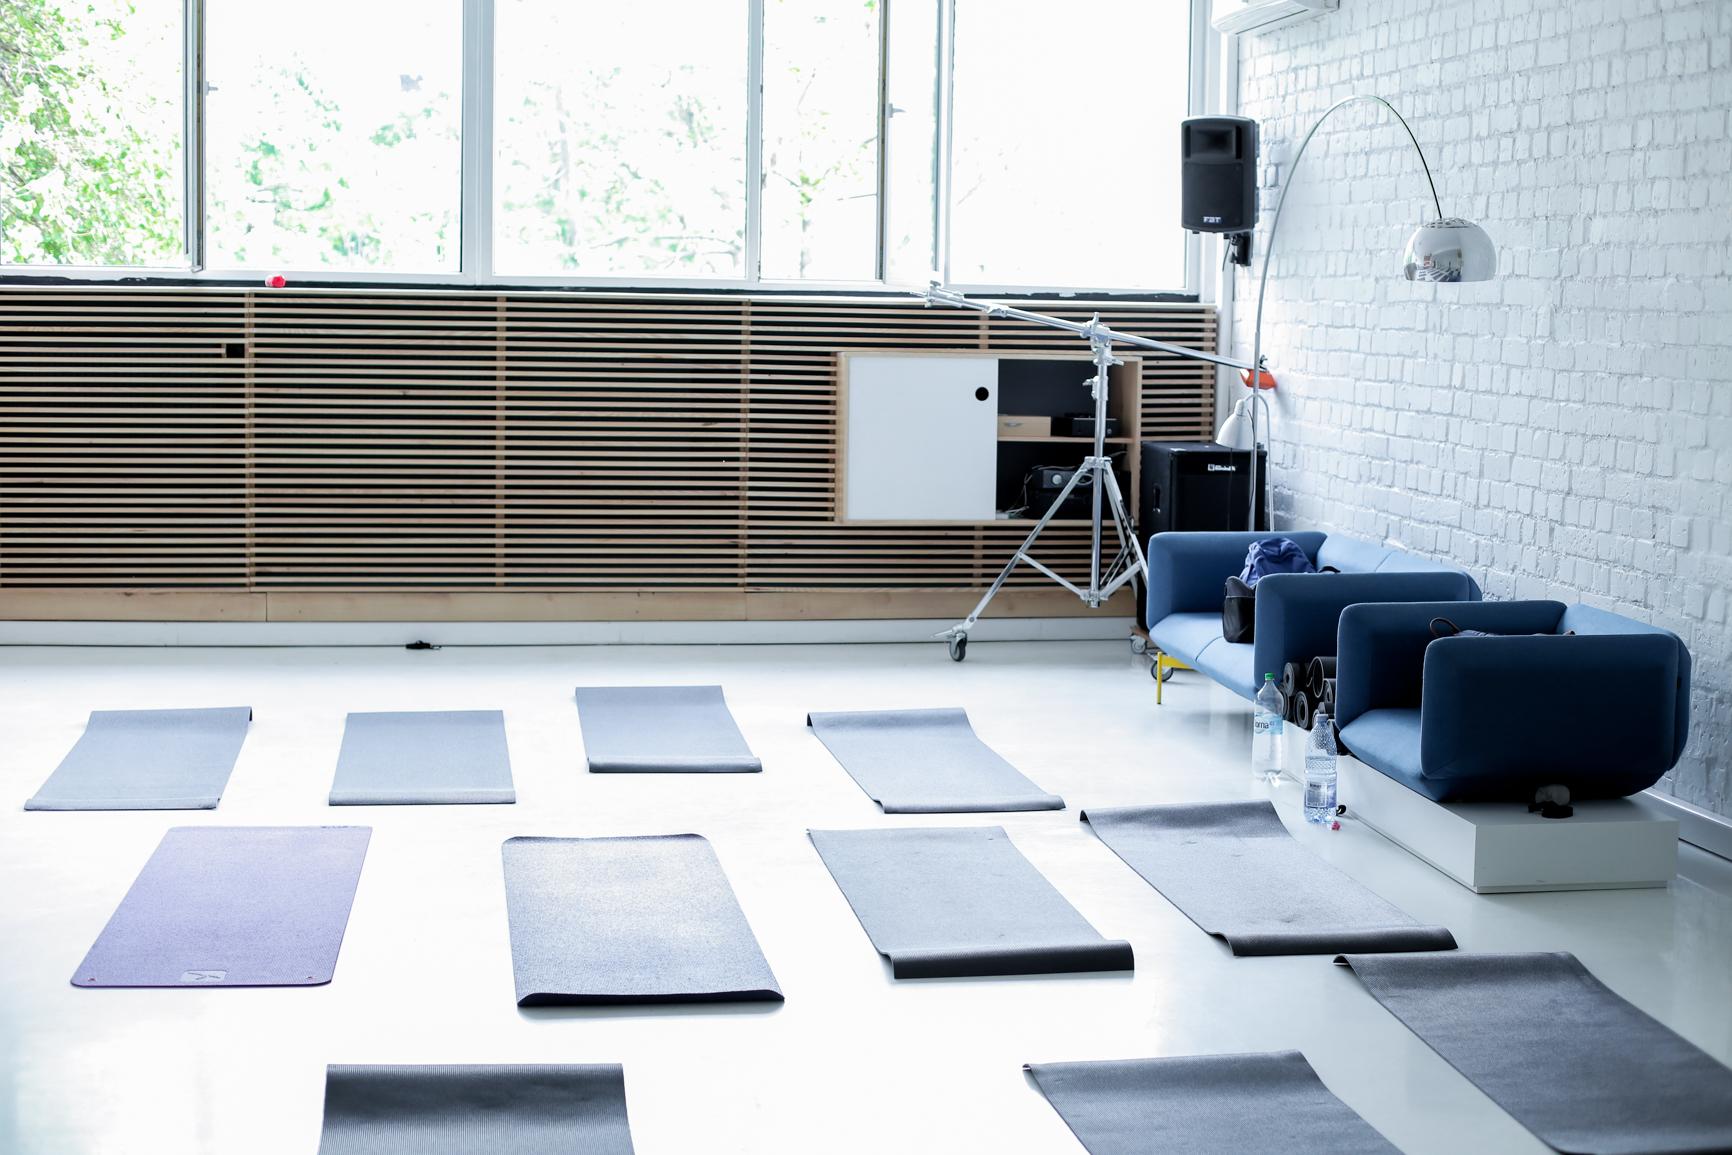 YOGA DAY - este un proiect Yoga City